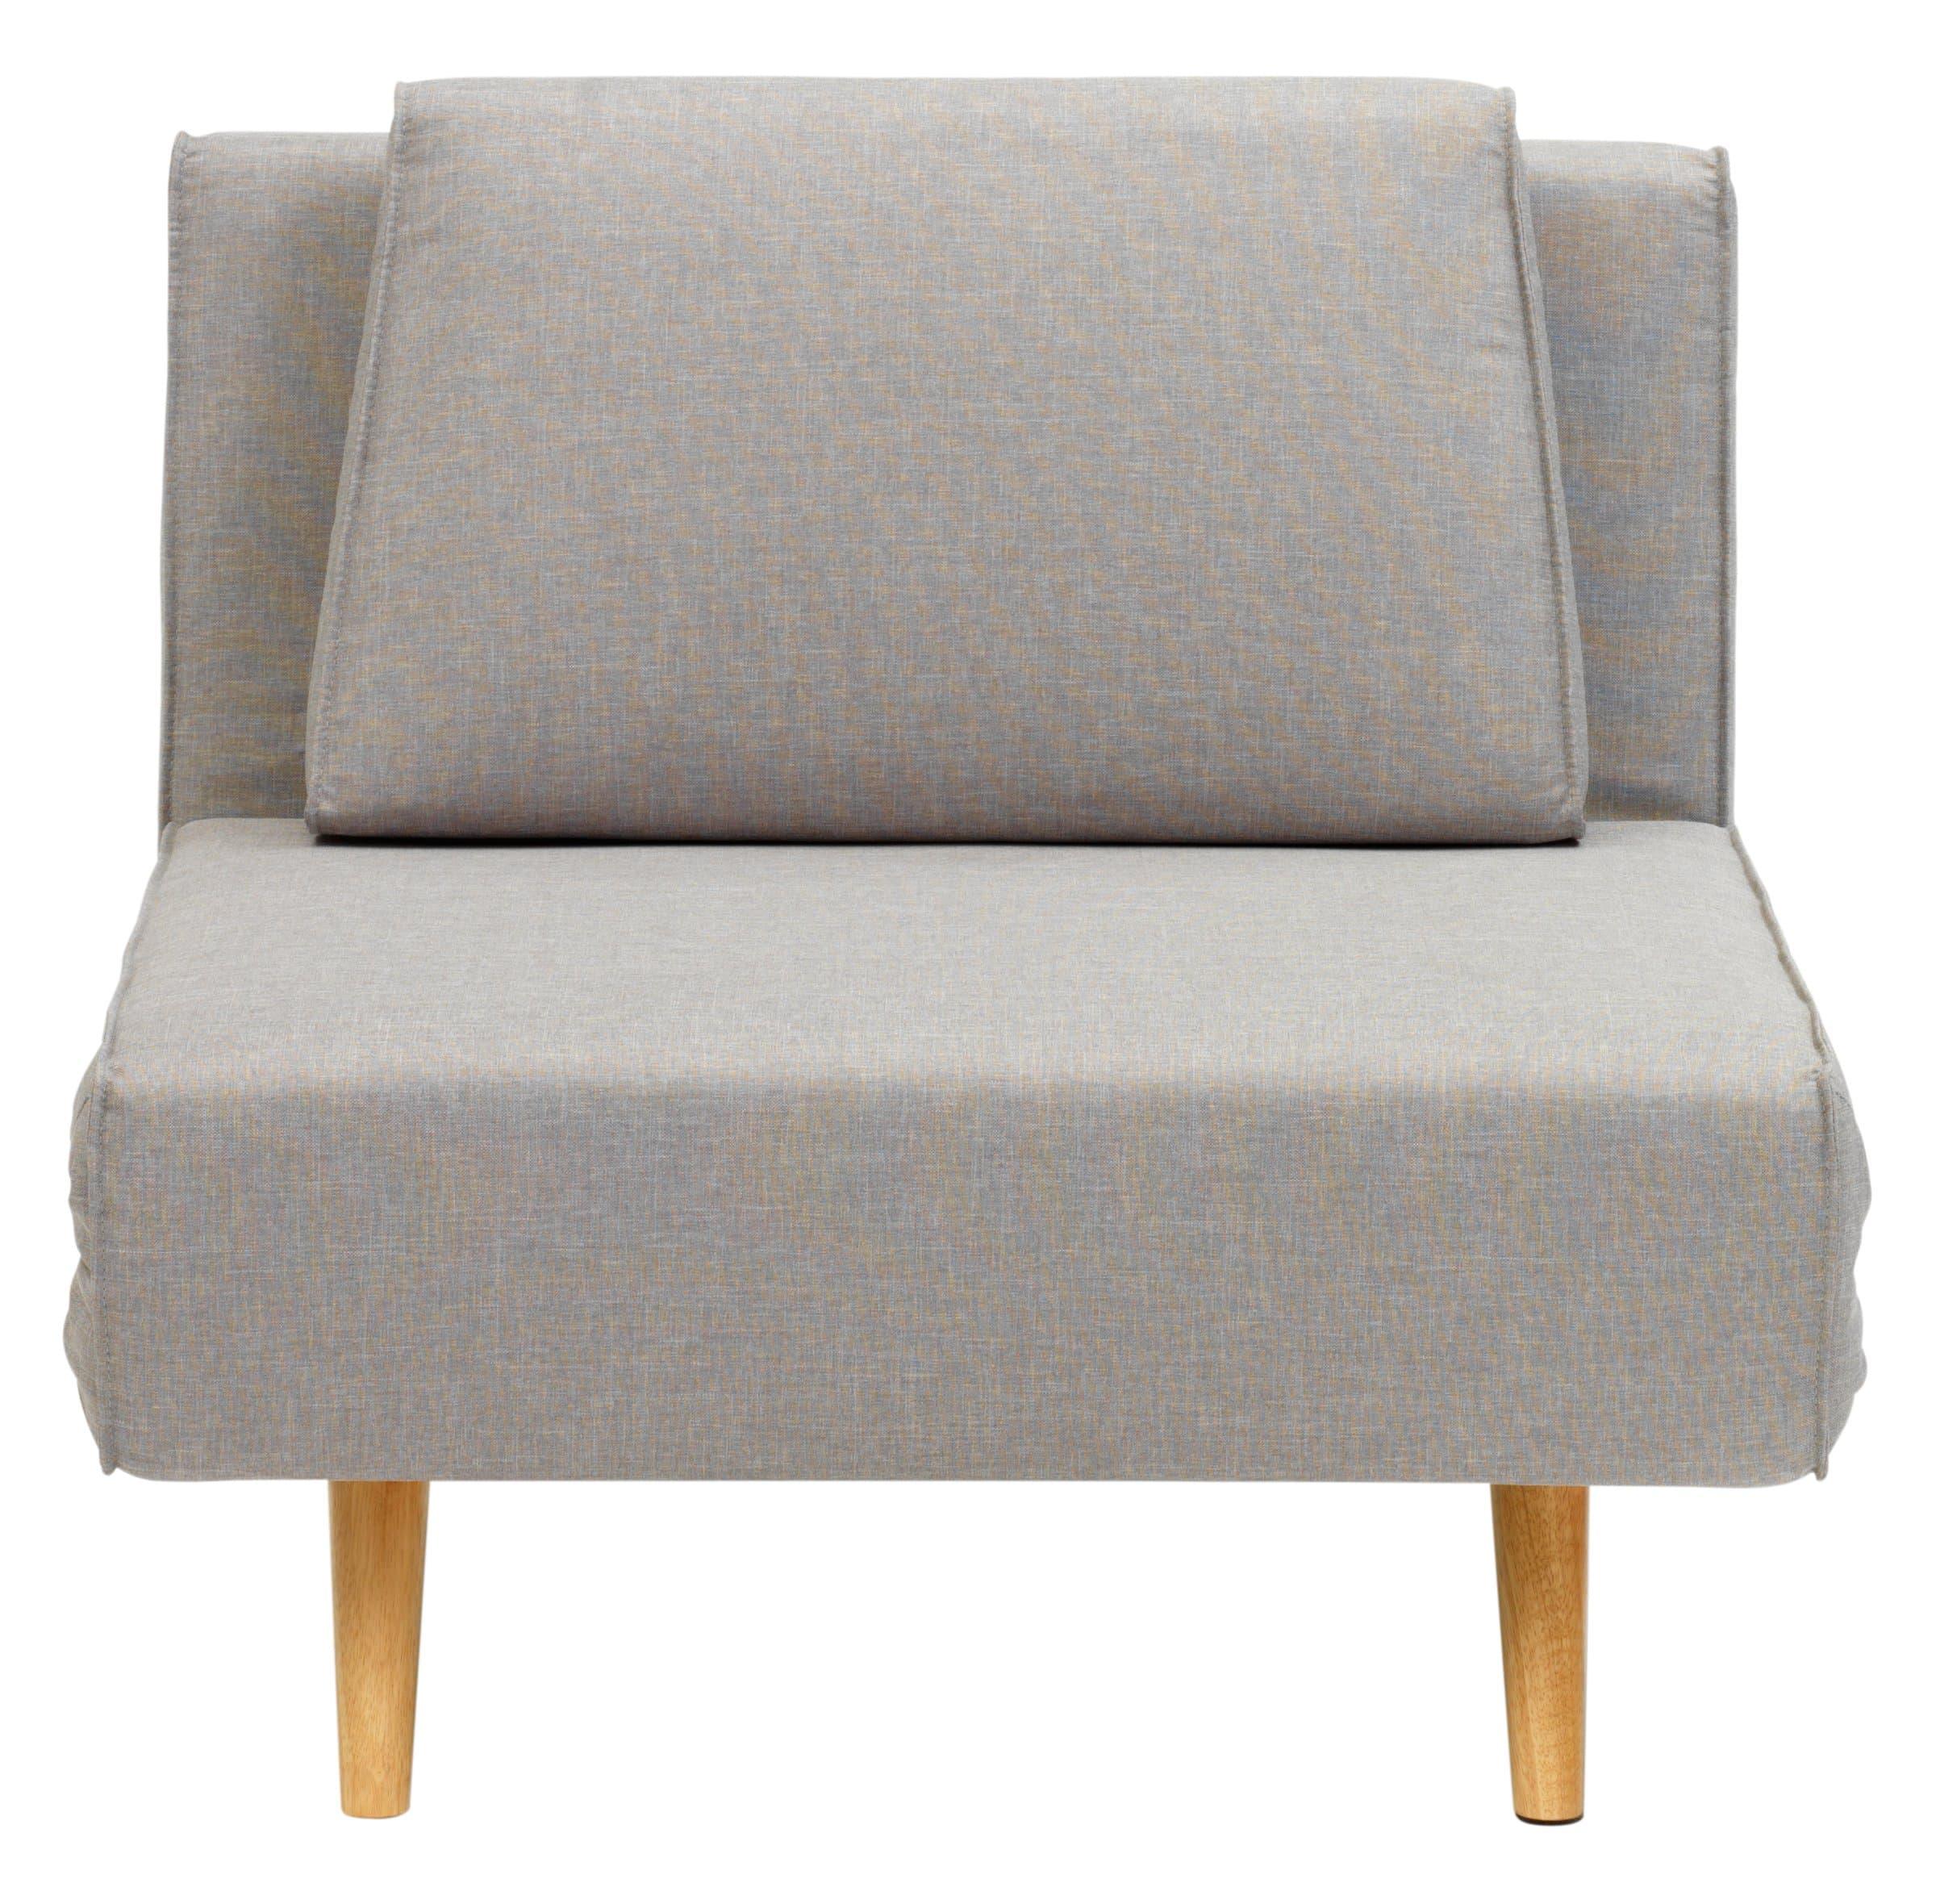 henni canap lit migros. Black Bedroom Furniture Sets. Home Design Ideas